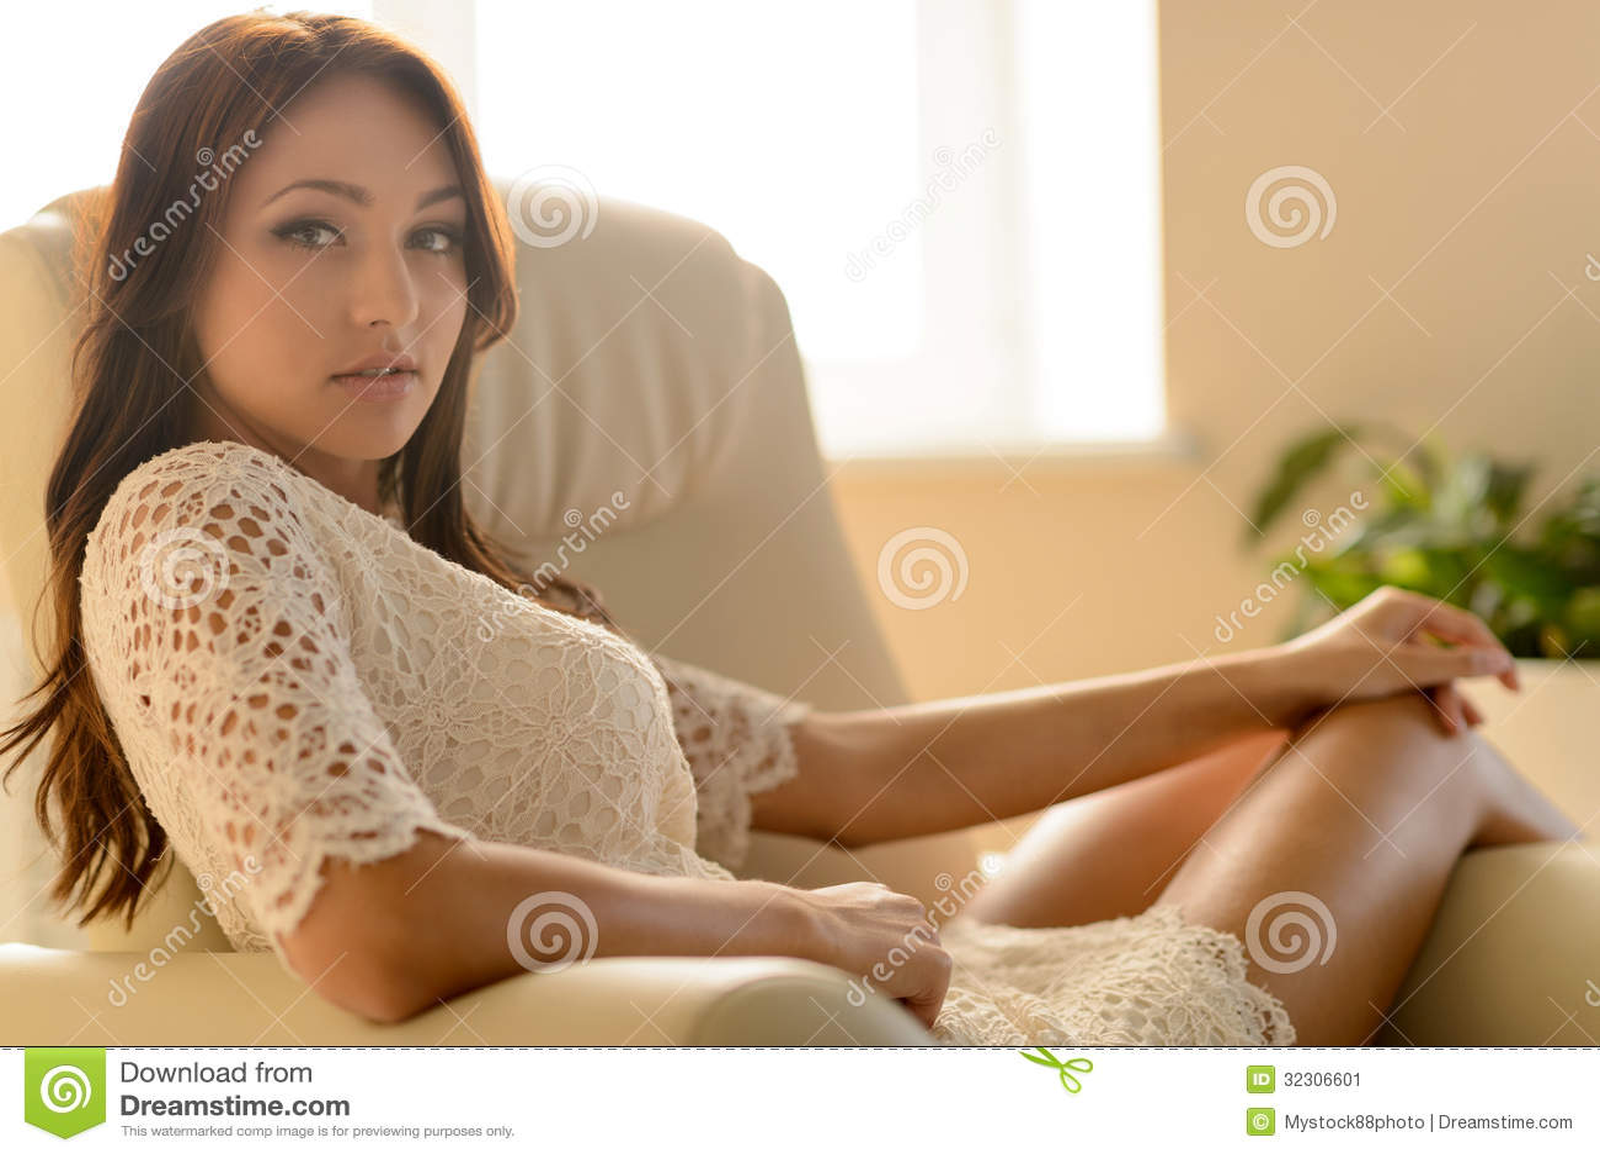 Mujeres en vdeo porno gratis de sexo ertico - Pornes